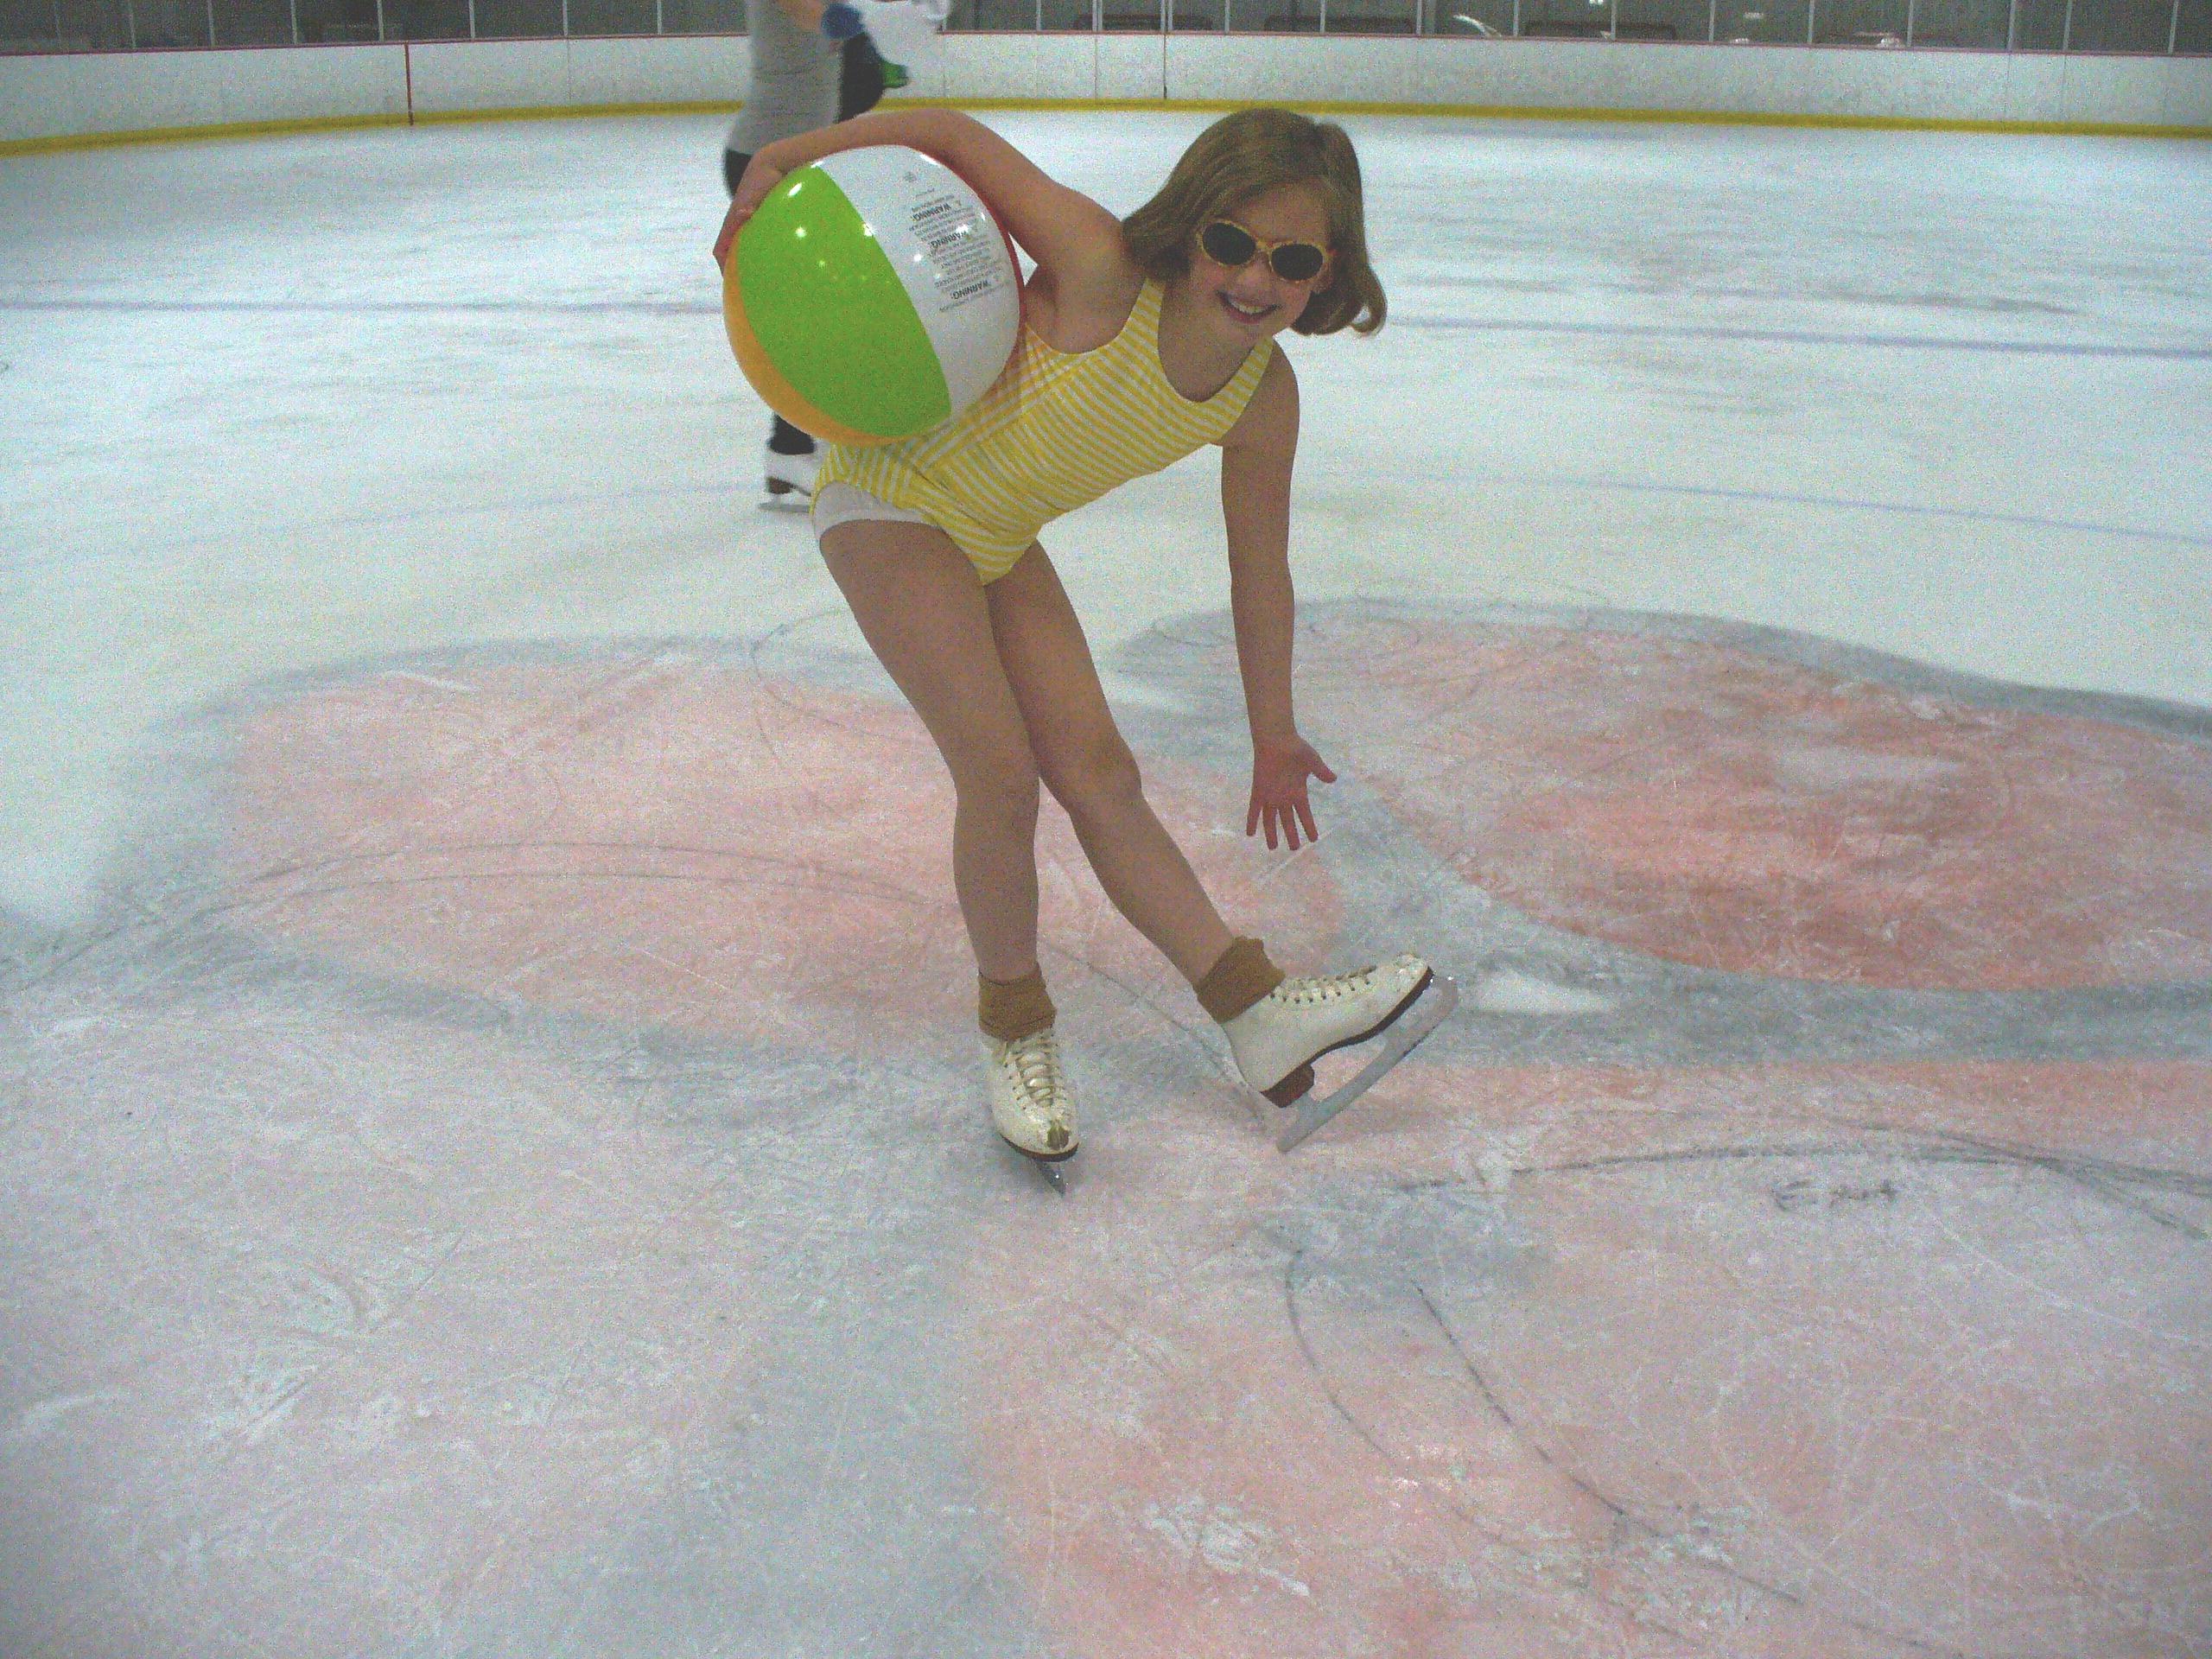 Girls got ice skating sex